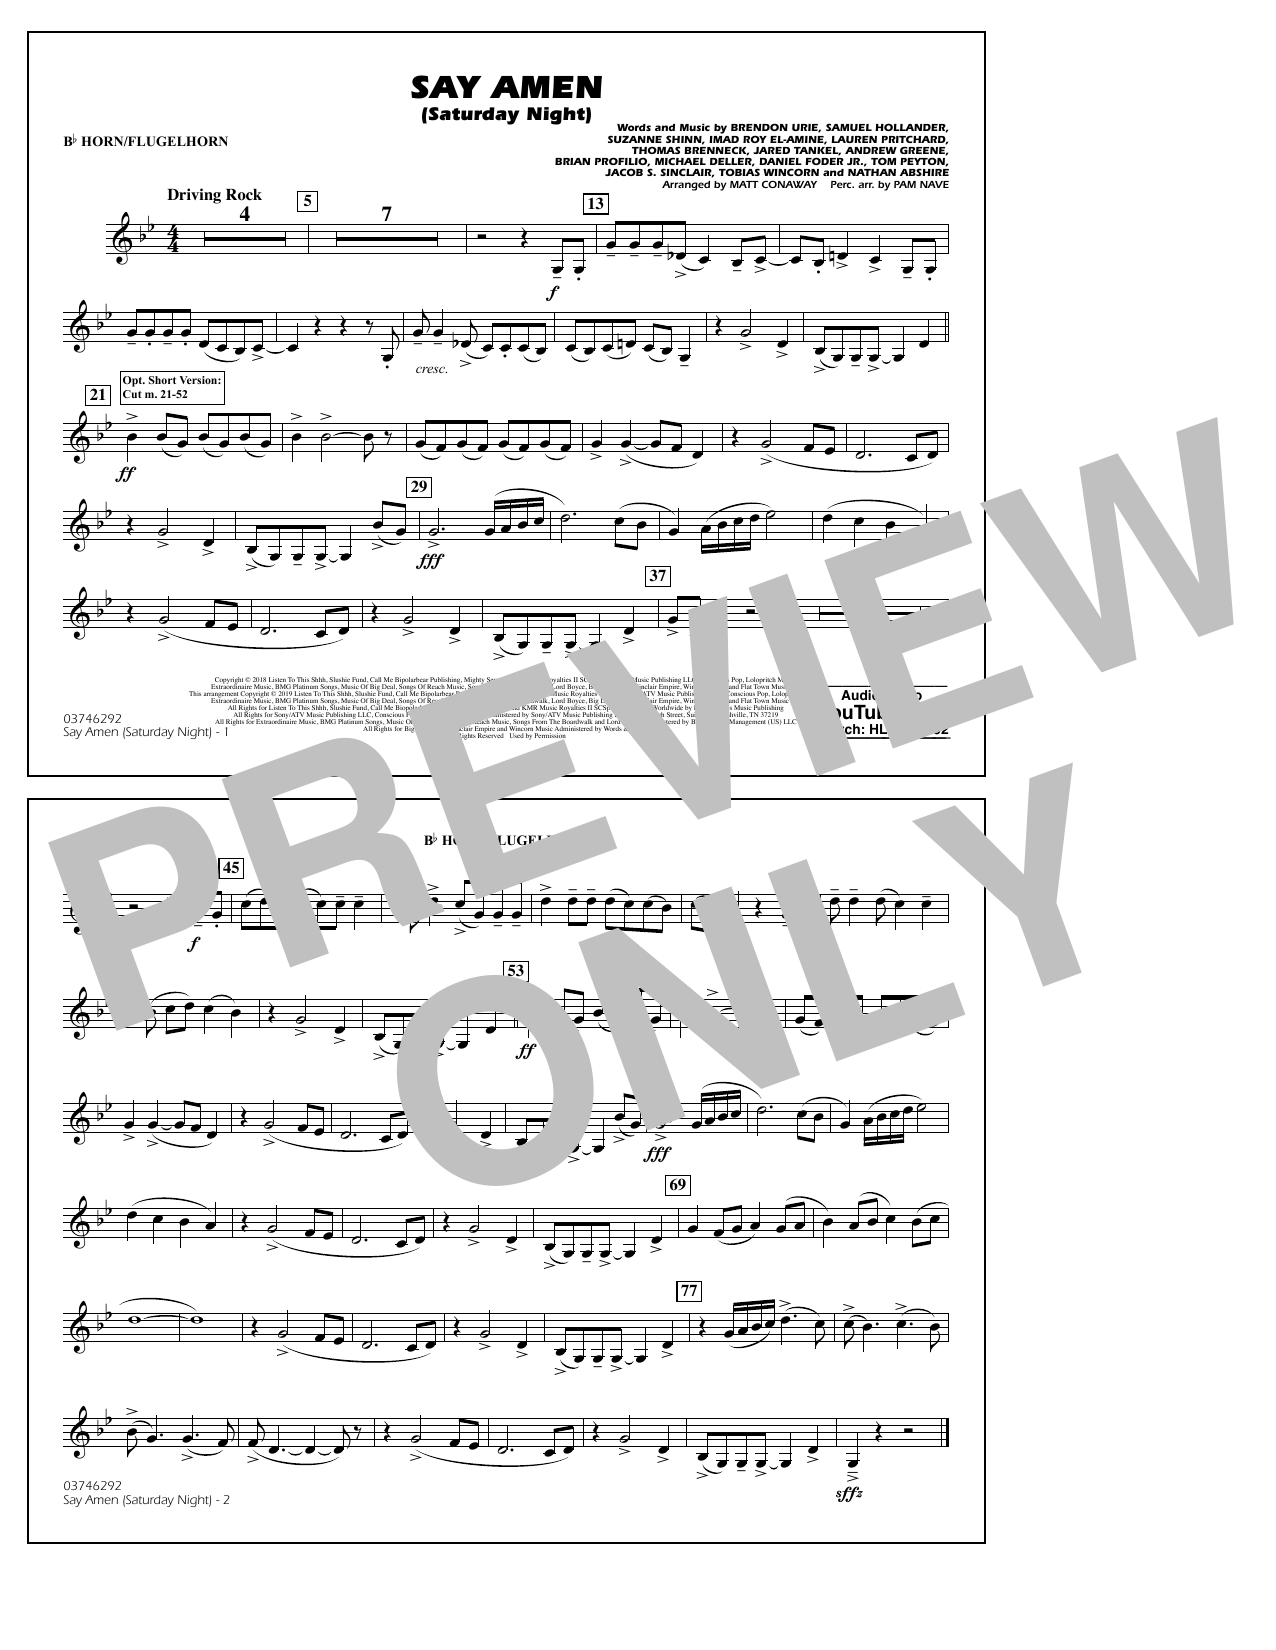 Panic At The Disco Say Amen Saturday Night arr. Matt Conaway   Bb  Horn/Flugelhorn Sheet Music Notes, Chords   Download Printable Marching  Band ...